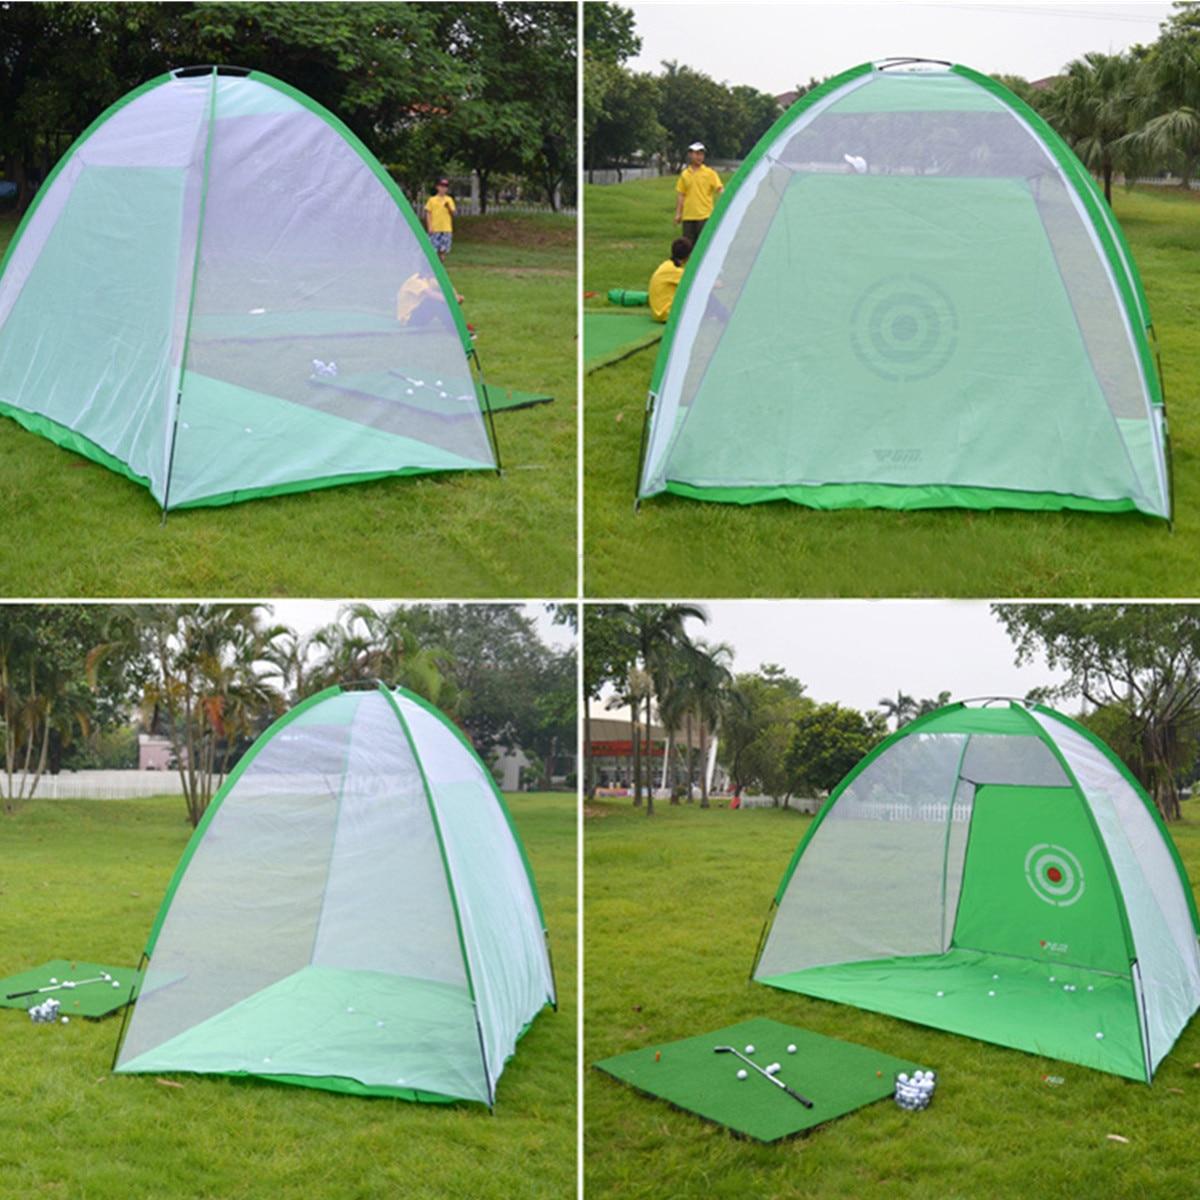 2*1.4m Golf Training Net Golf Practice Nets Indoor Outdoor Garden Training Portable Golf Practice Tent Golf Training Equipment